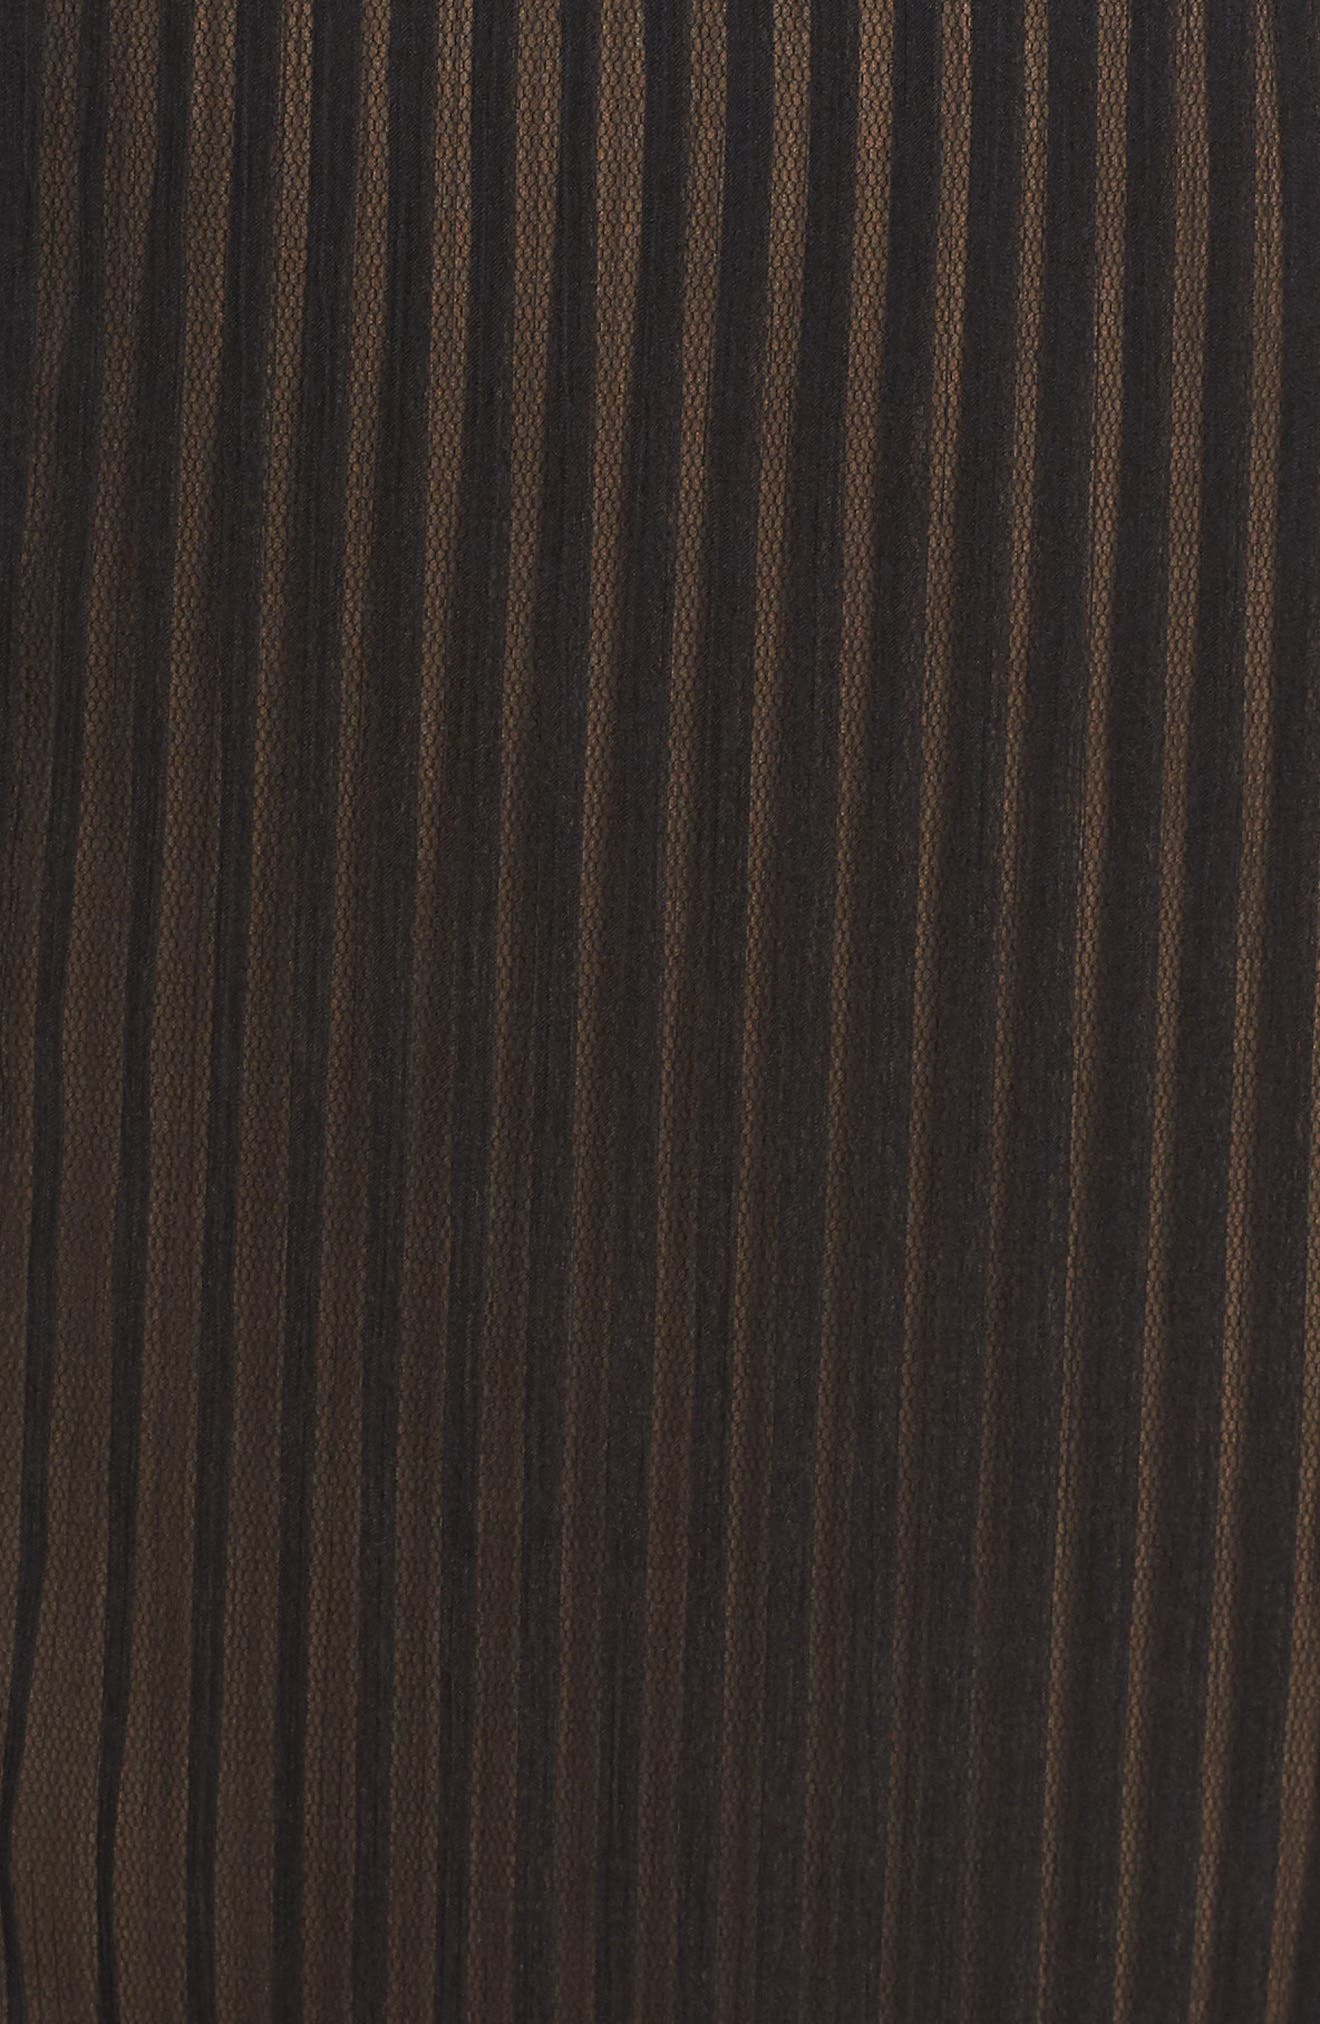 Lace & Chiffon A-Line Dress,                             Alternate thumbnail 5, color,                             Black/ Nude